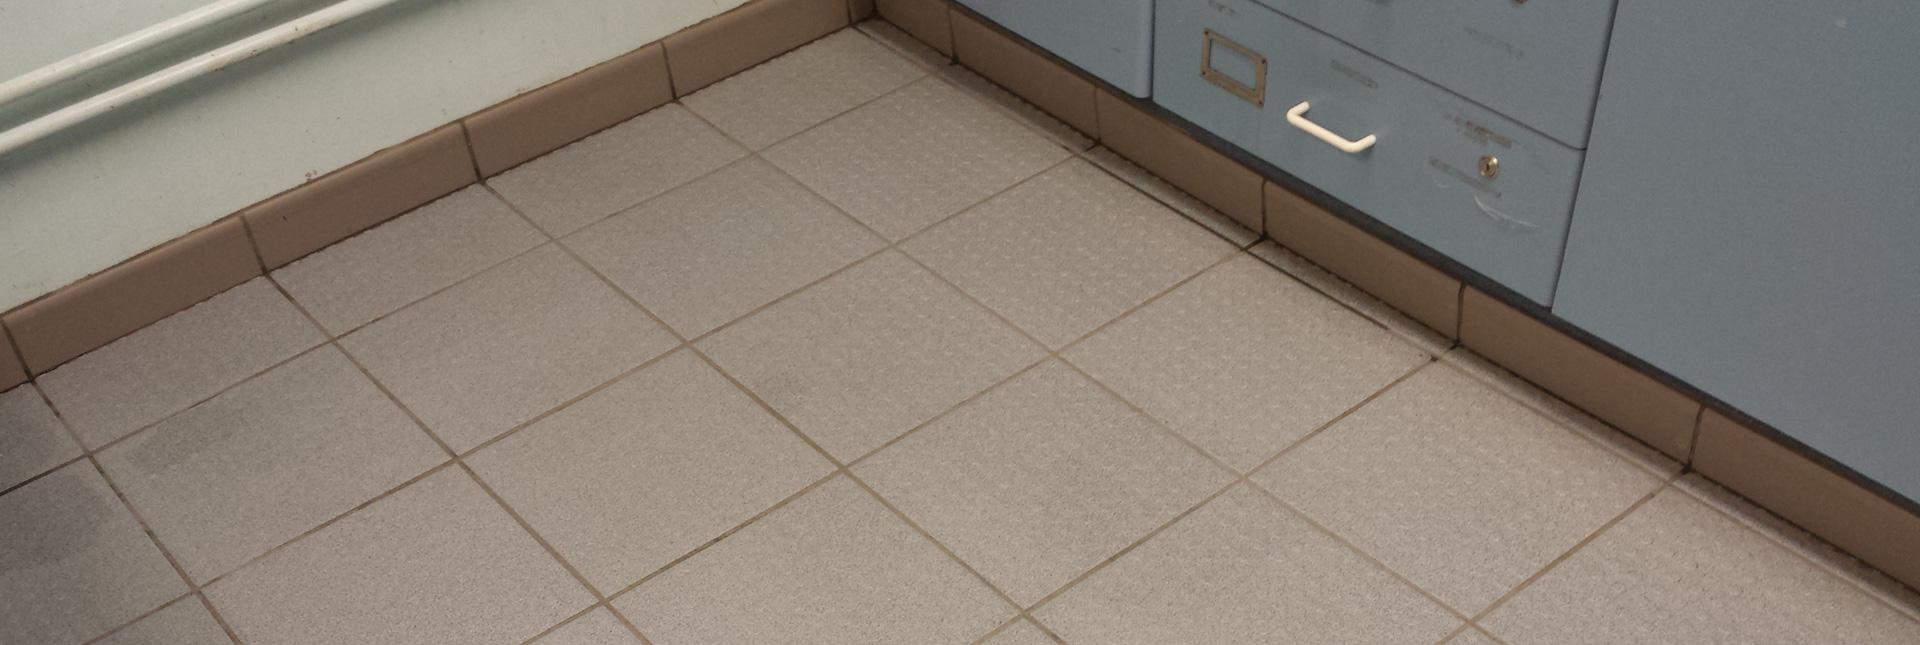 commercial-tile-grout-3